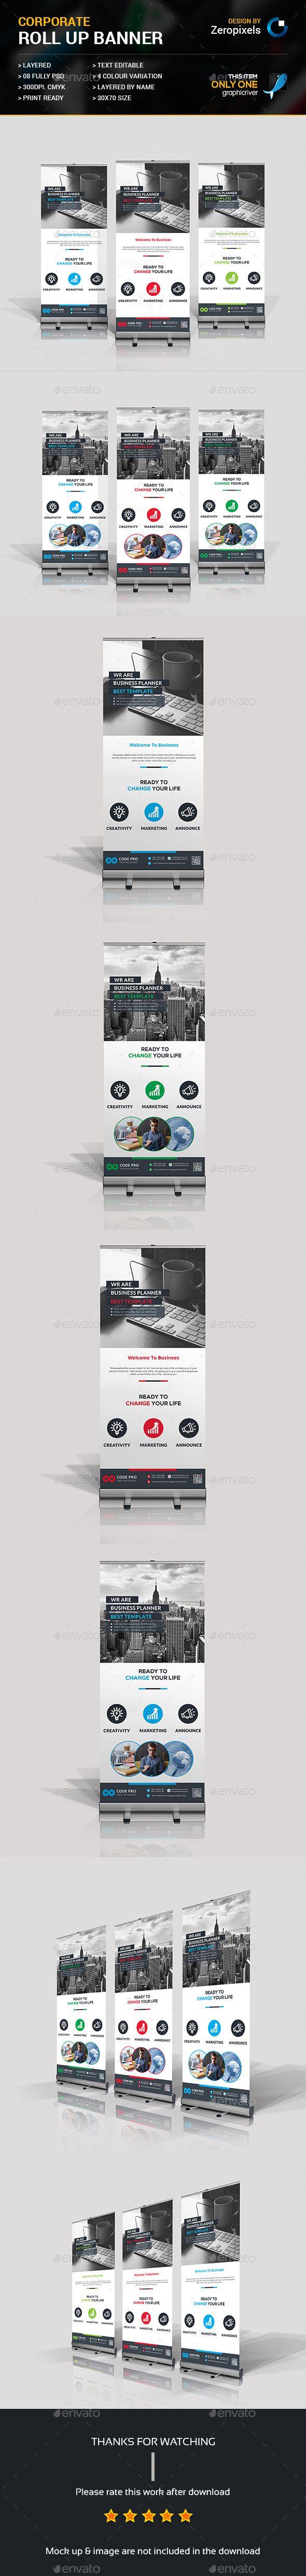 Roll Up Banner Design Template Bundle - Signage Print Template PSD. Download her...